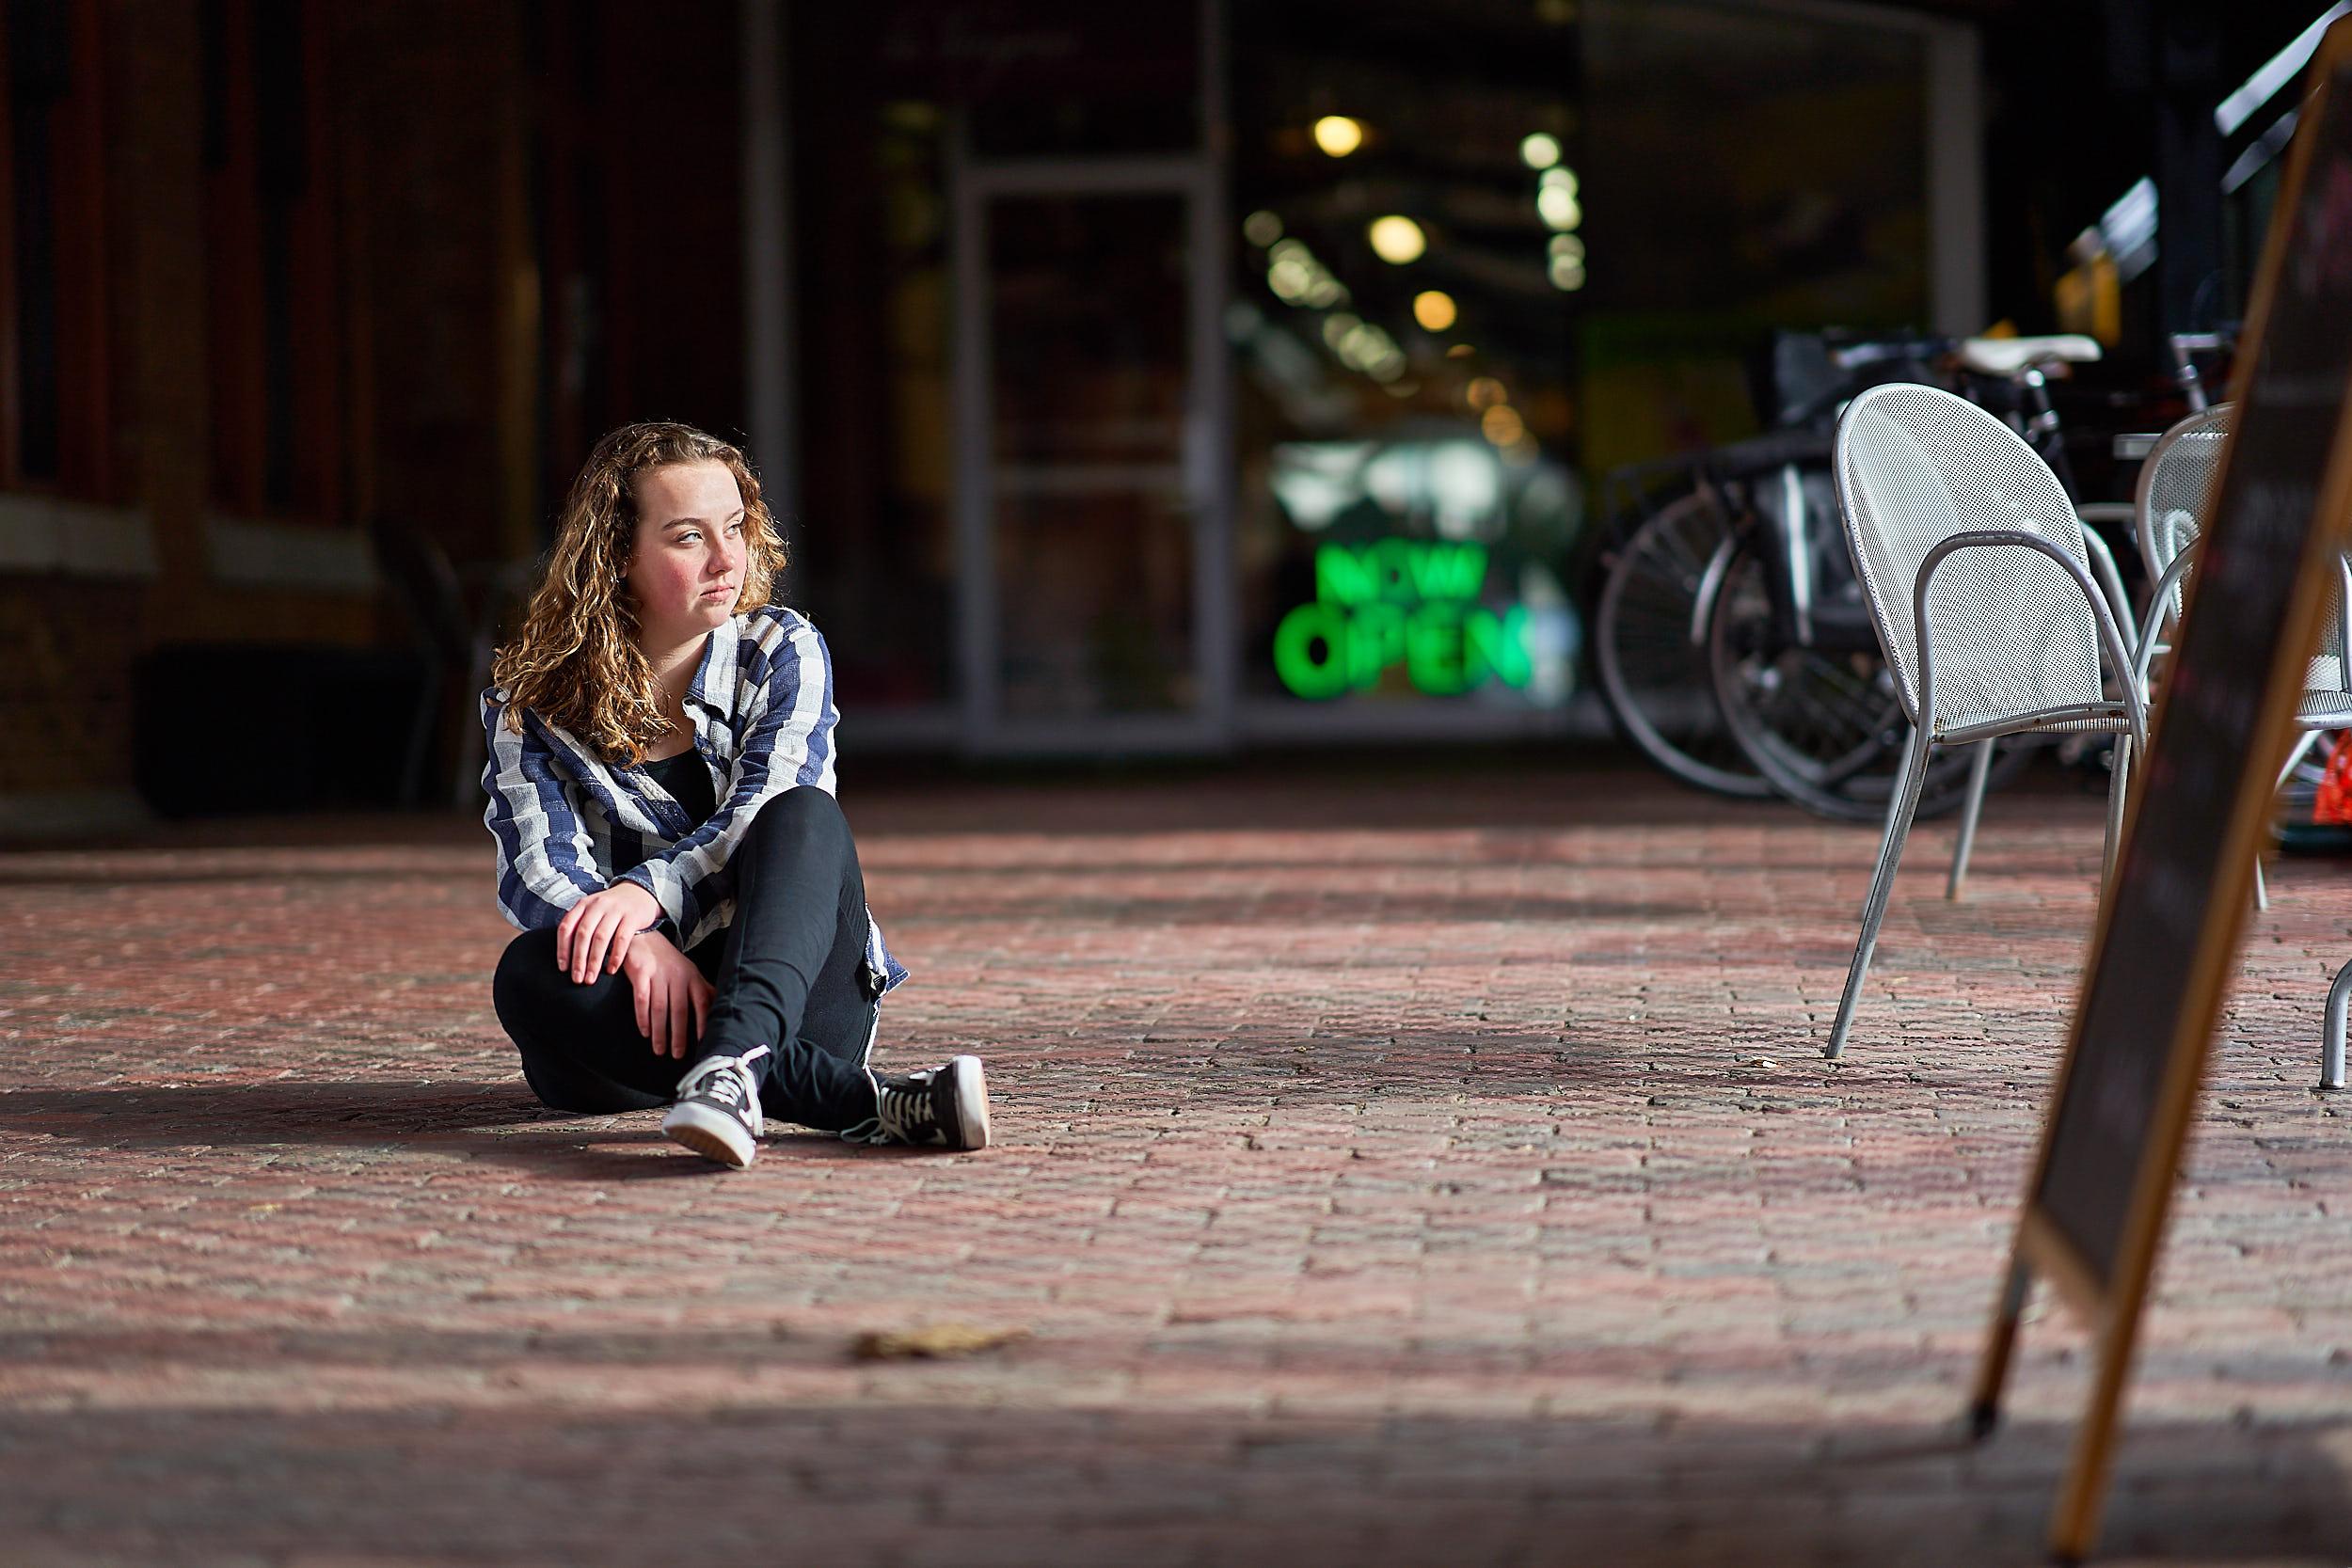 Teenage Girl Sitting Portrait | Photo By BillyBengtson.com